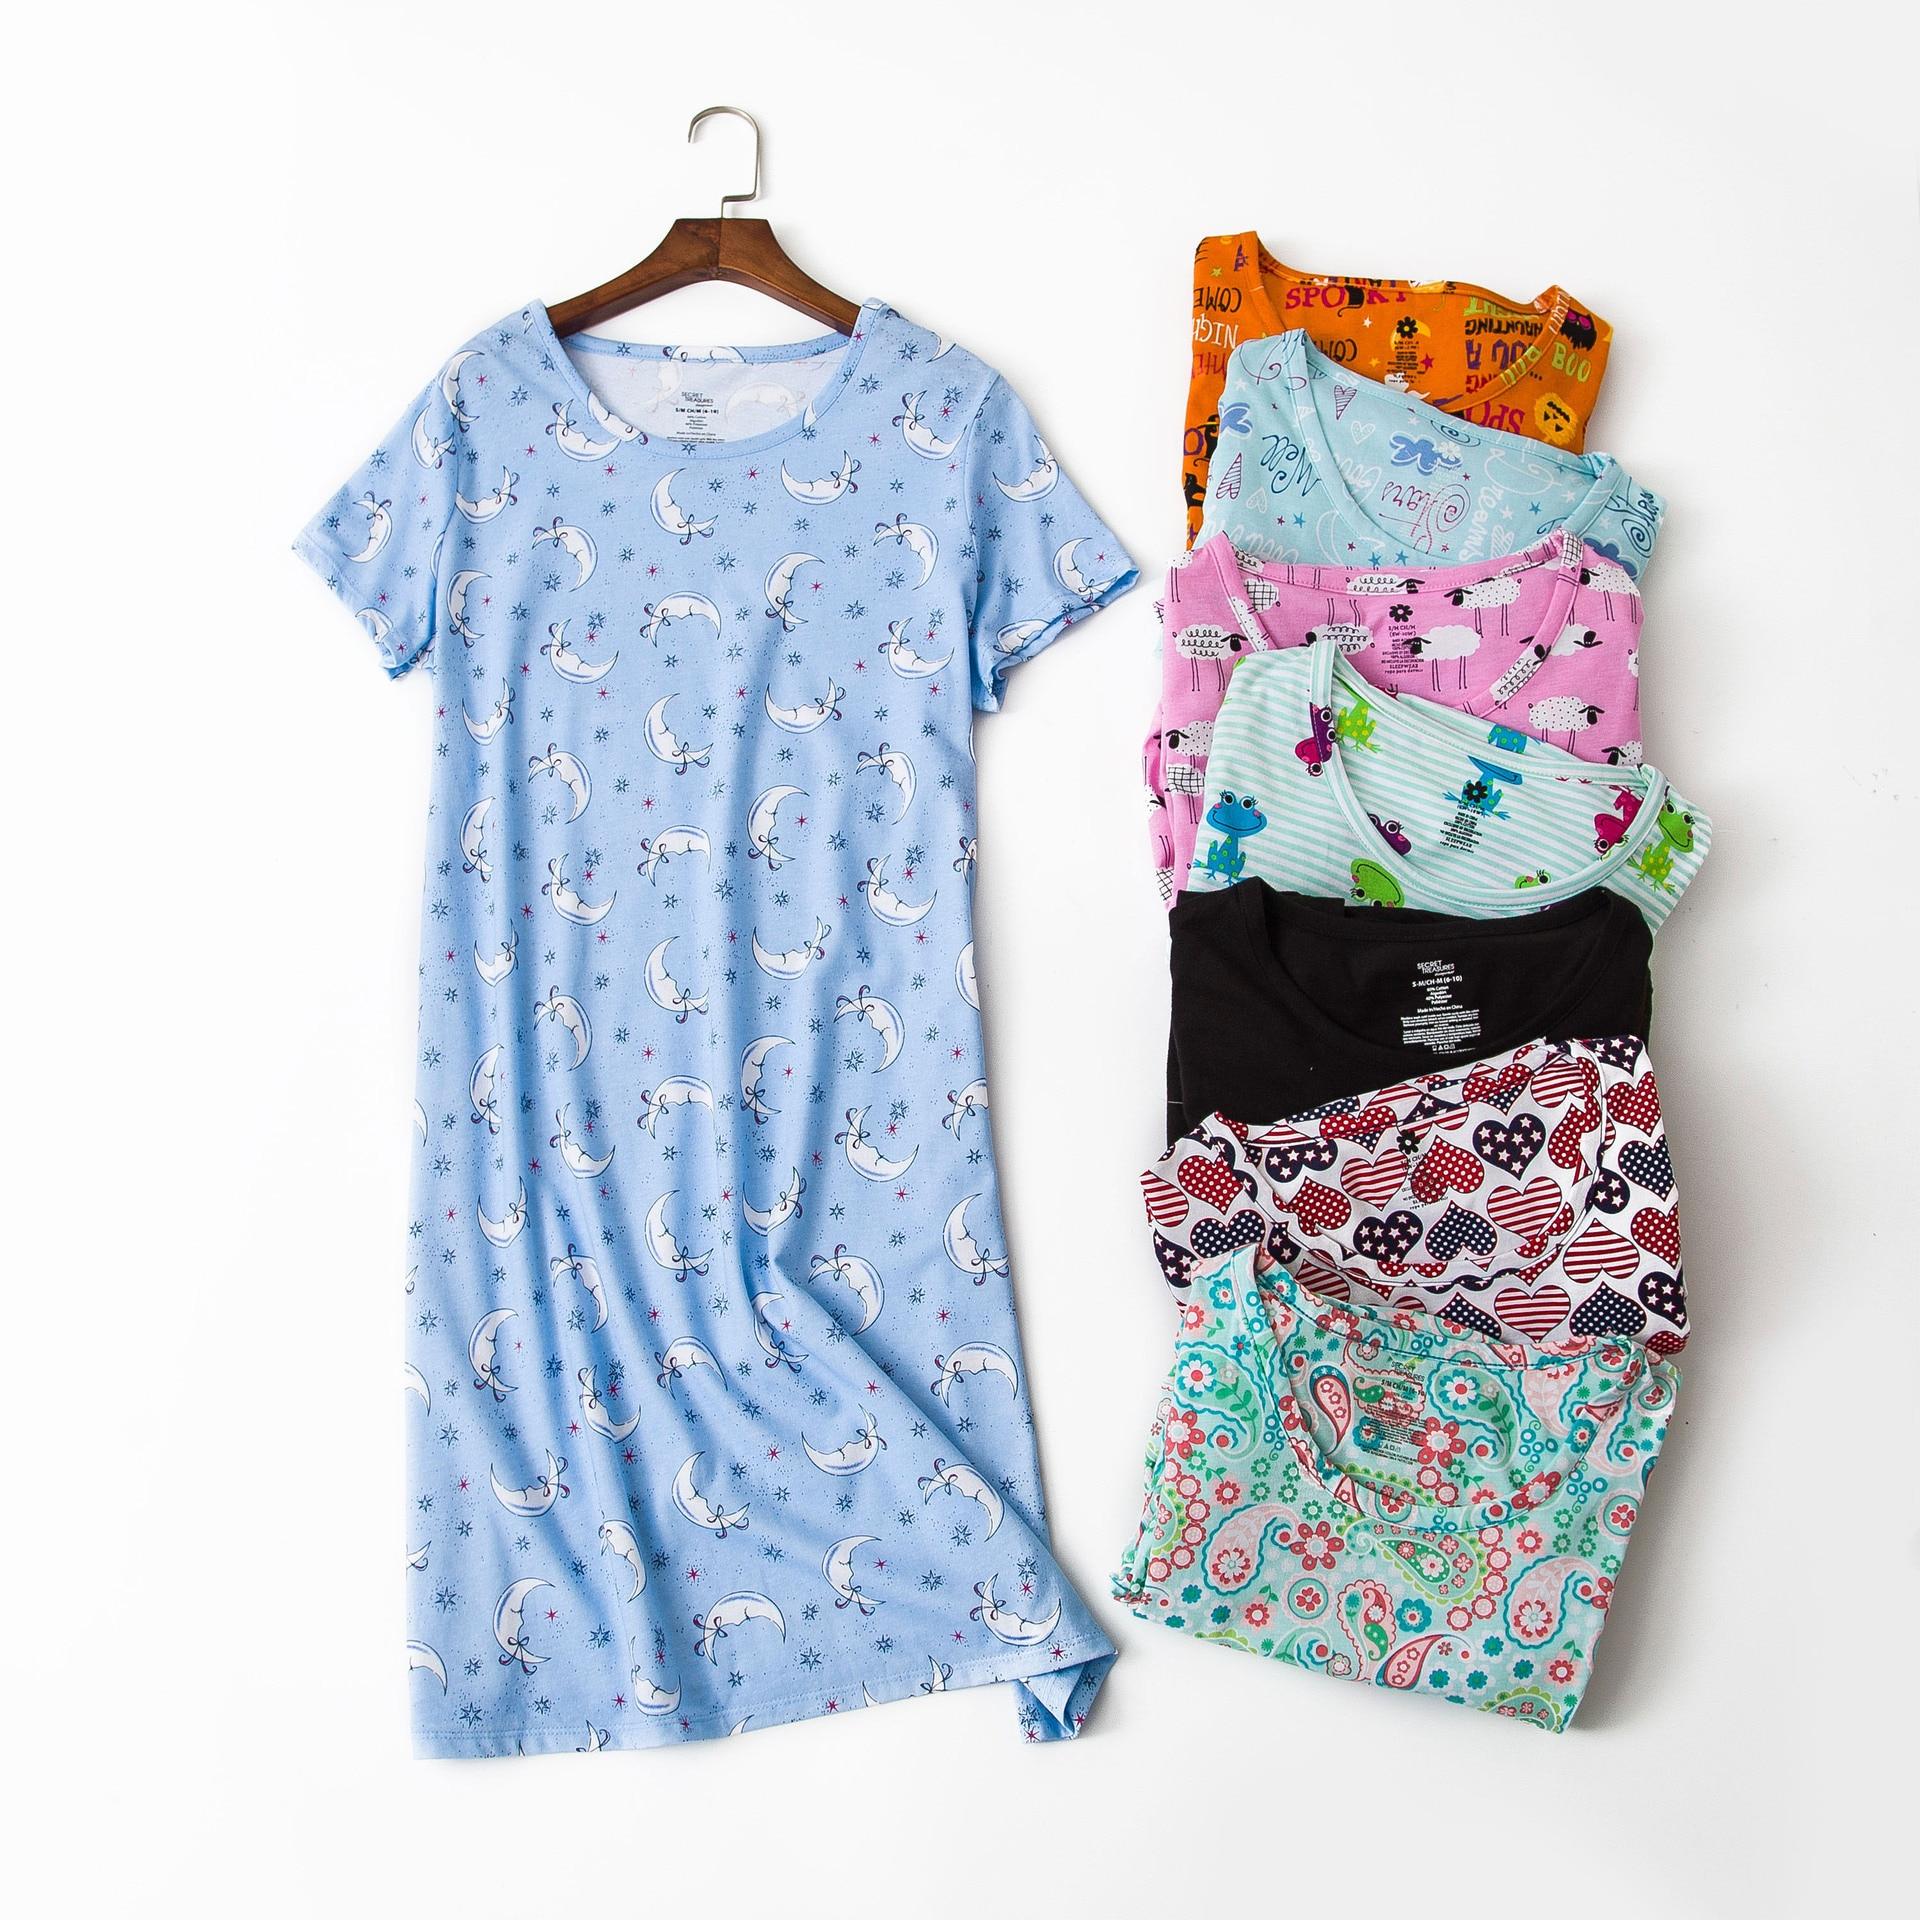 New 100% Cotton Short Sleeved   Nightgowns   Cute Cartoon Family Clothes Women   Sleepshirts   Plus Size Sleeping Skirt Simple Dresses